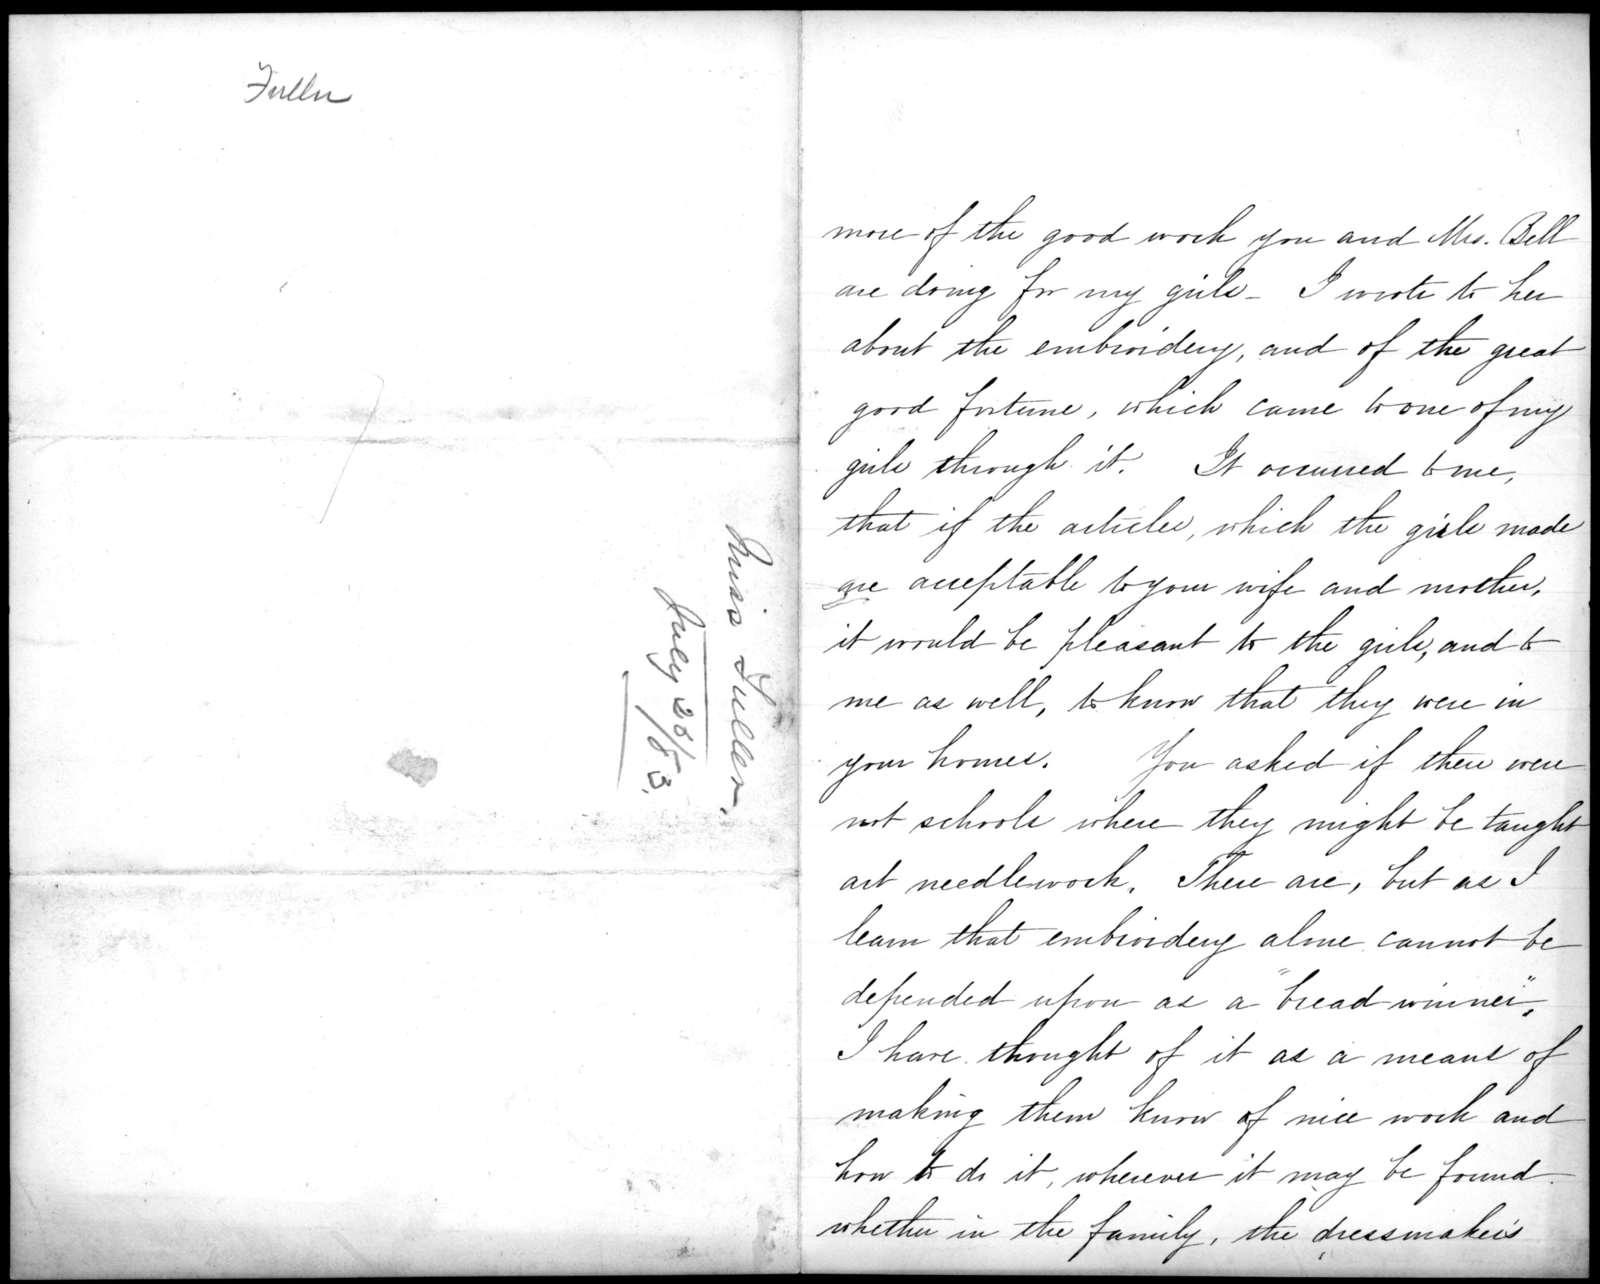 Letter from Sarah Fuller to Alexander Graham Bell, July 26, 1883